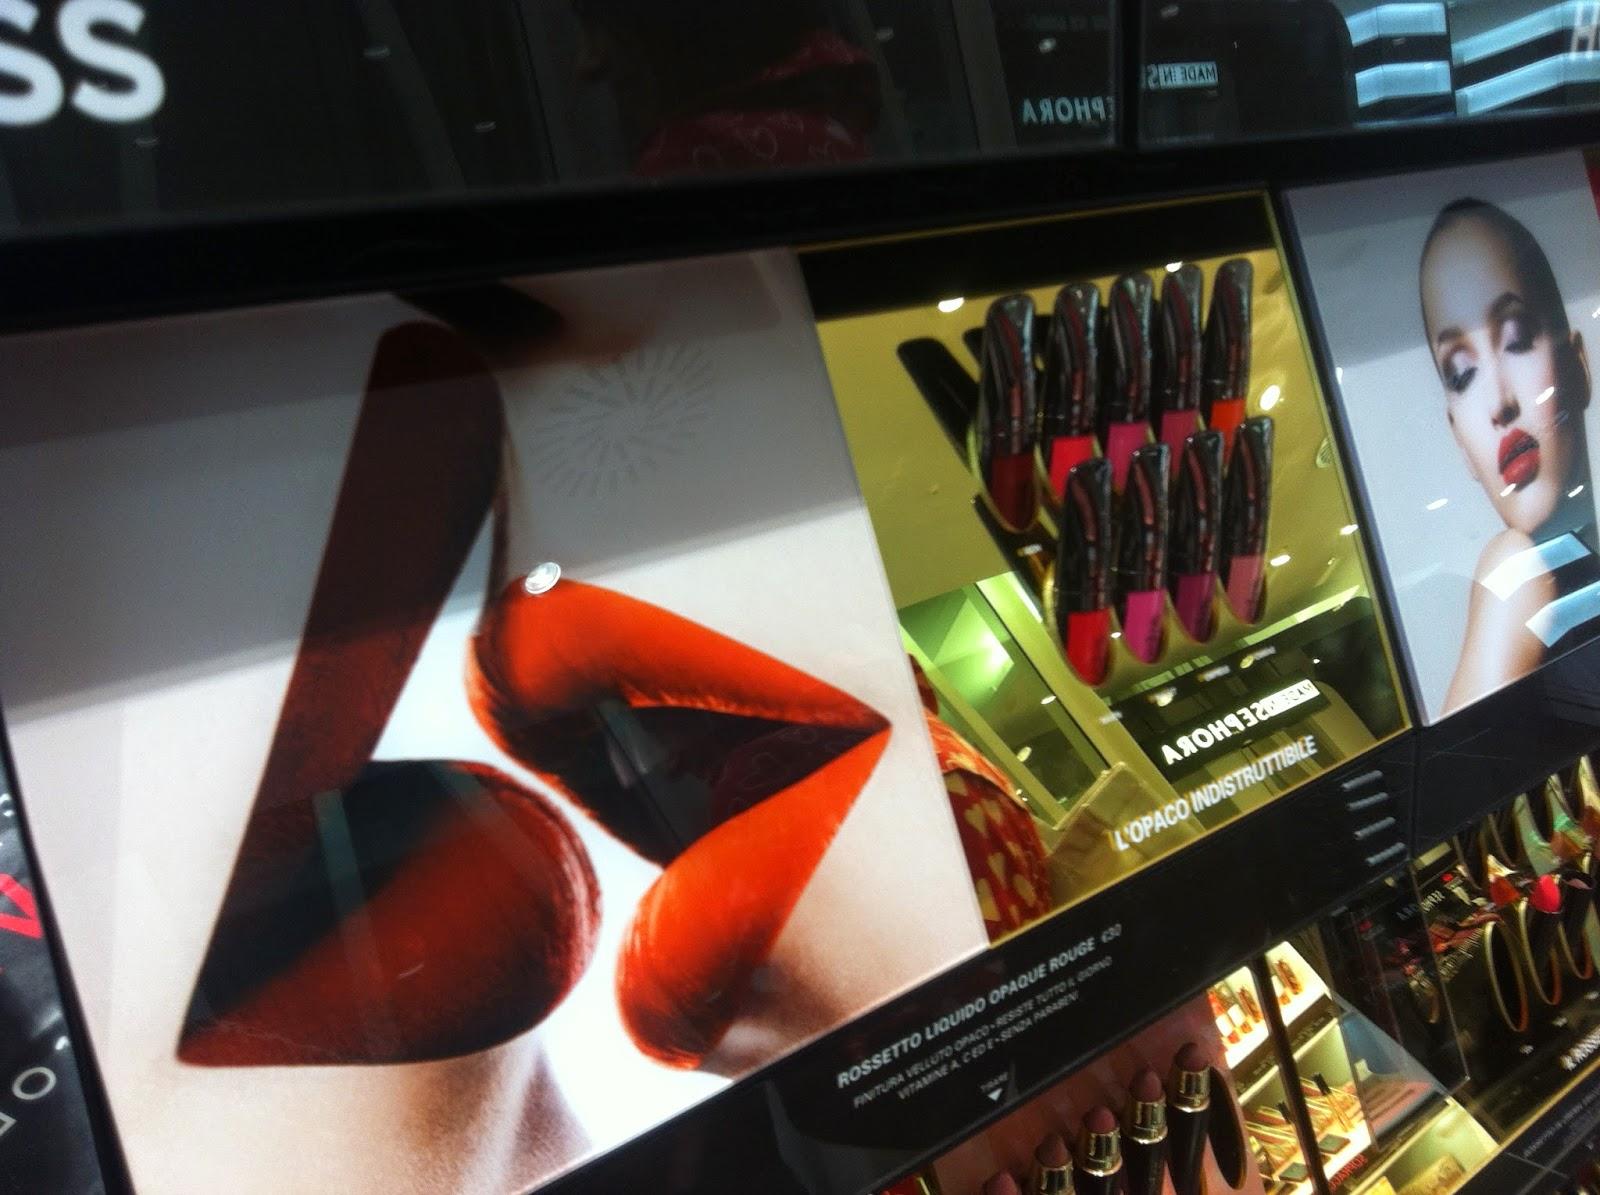 hourglass cosmetics italia sephora, opaque rouge liquid lipstick, brian & barry building sephora milano